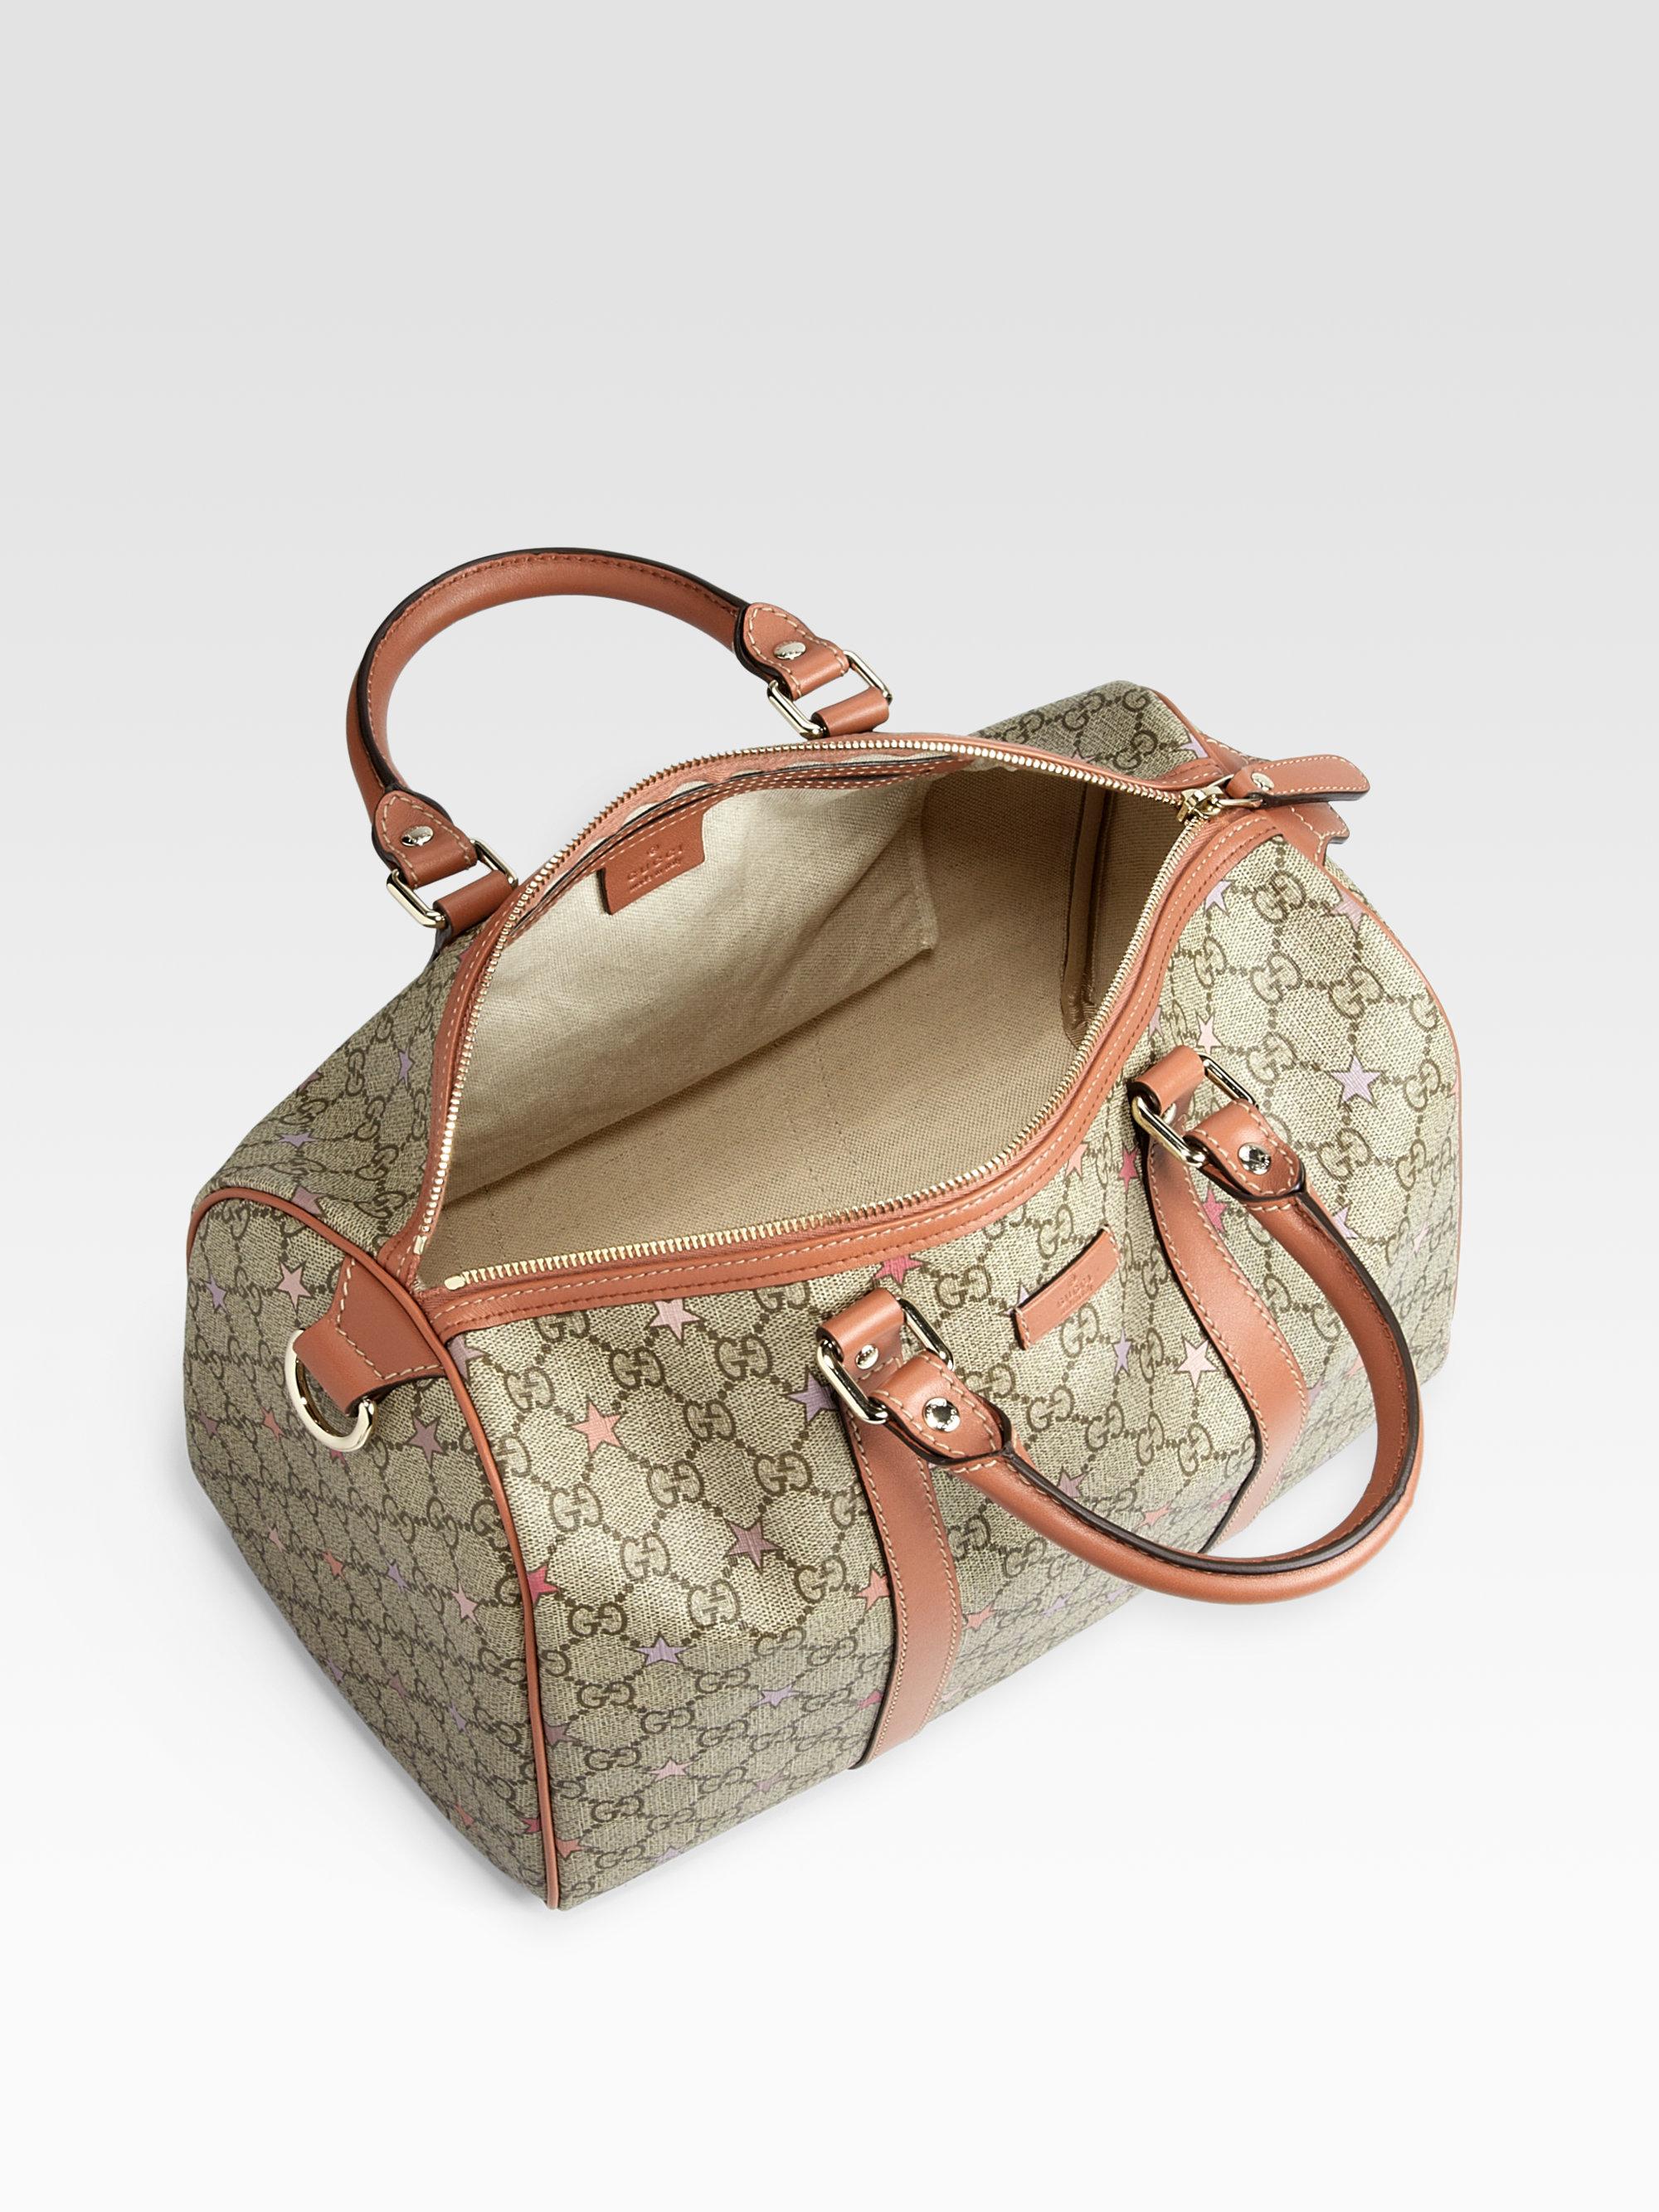 bf48a4762b98cf Gucci Joy Gg Supreme Stars Canvas Boston Bag in Natural - Lyst